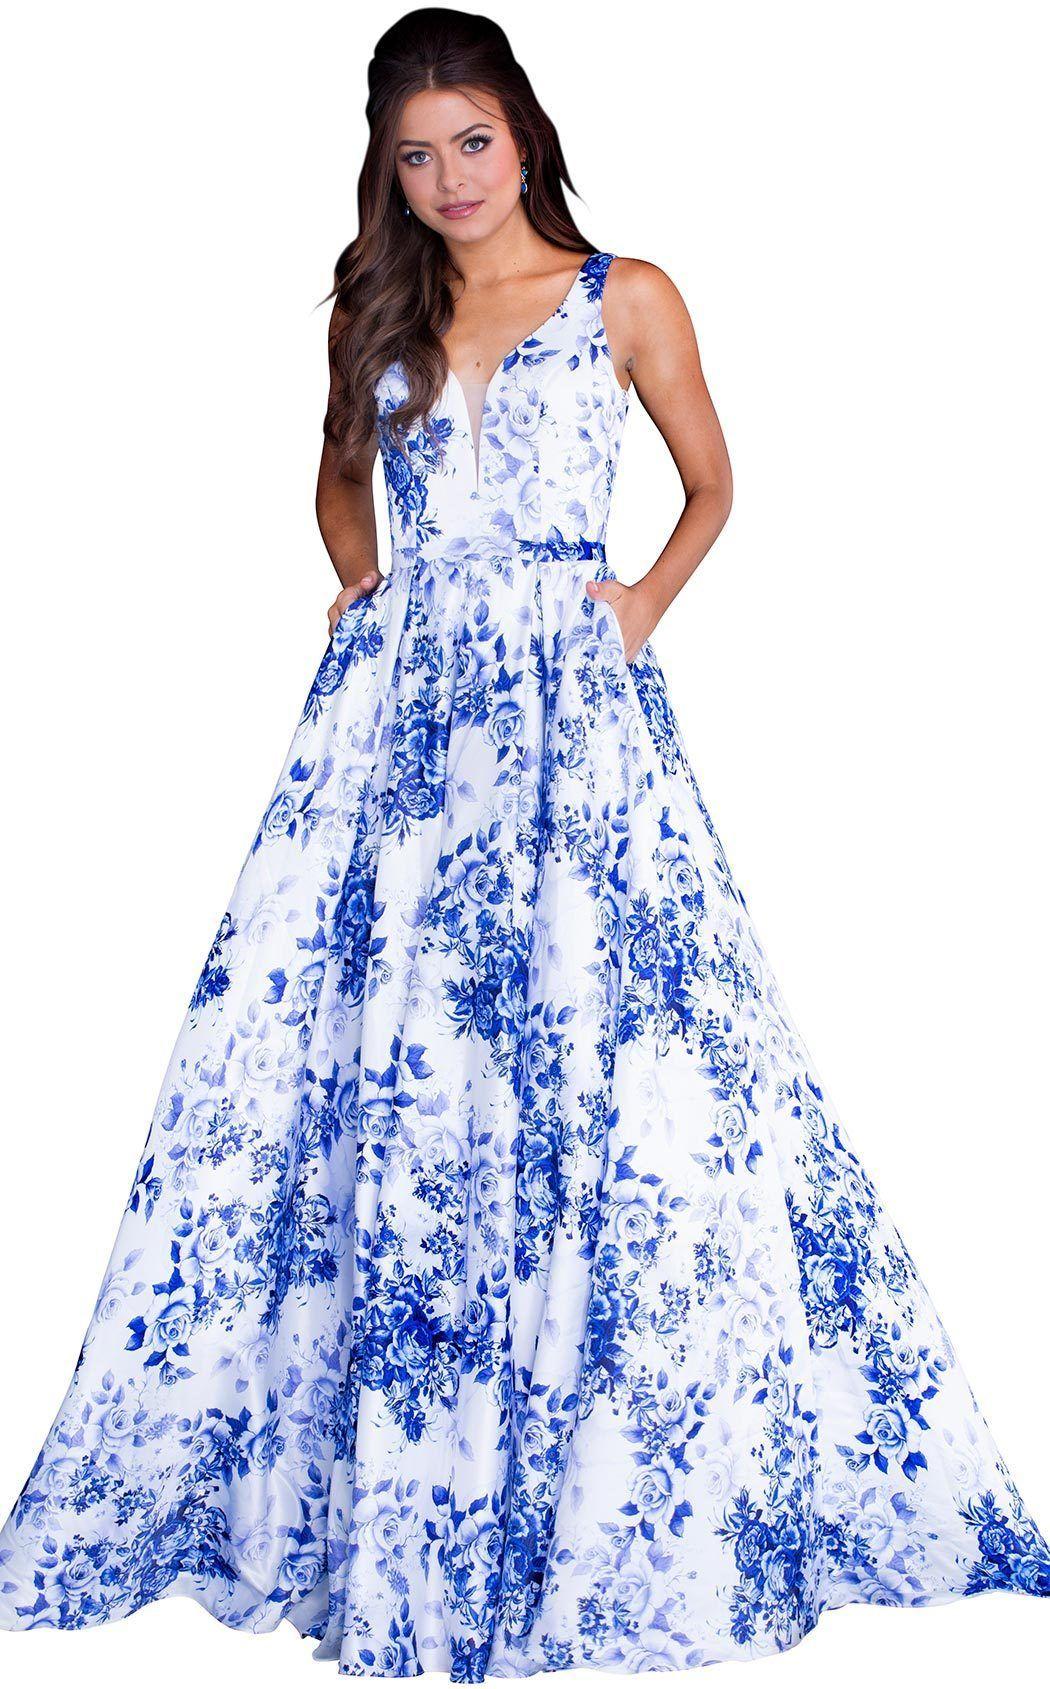 f110c404c9 Jovani - Printed Ball Gown V-Neckline Dress. JVN 60561. JVN 60561 Blue And  White ...